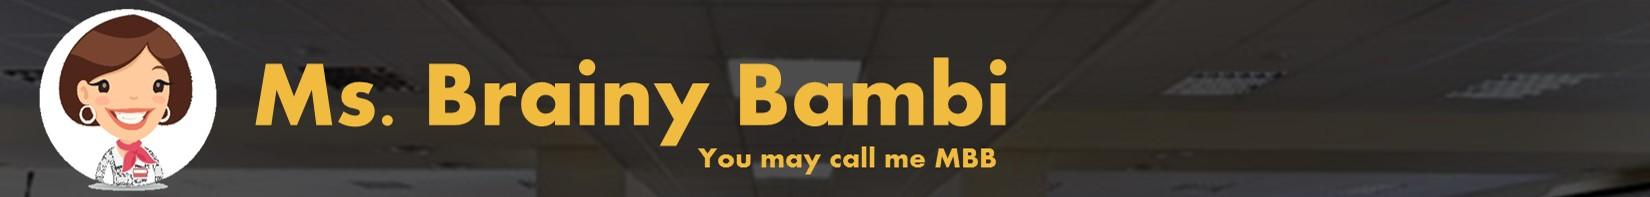 Ms Brainy Bambi MBB